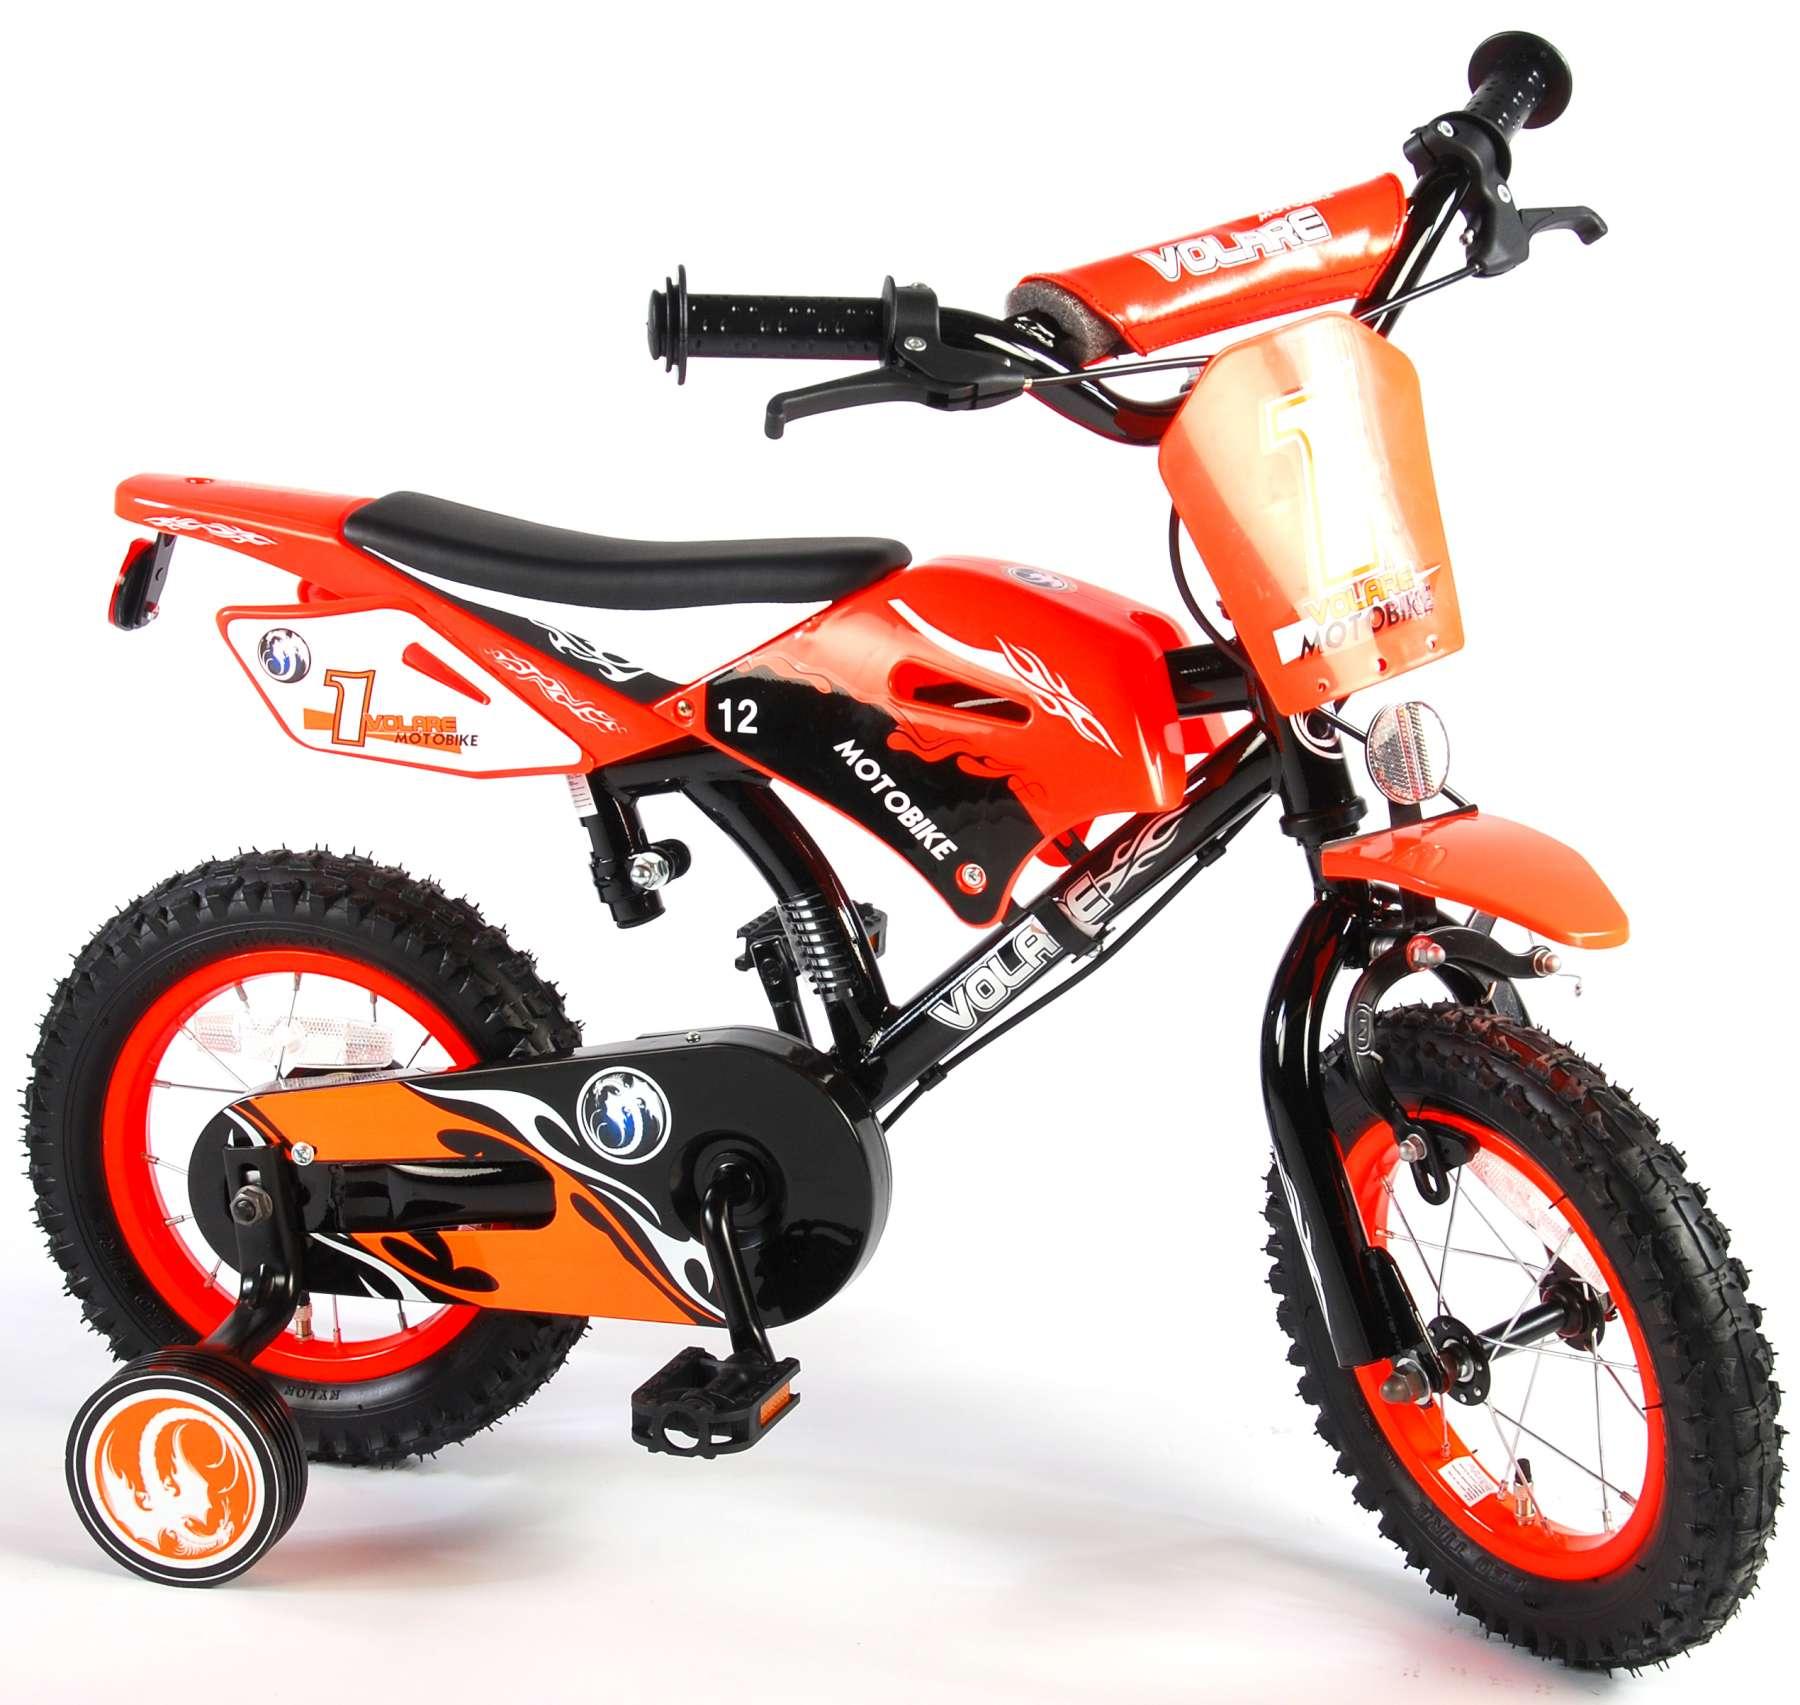 Bicicleta Motorbike de 12 pulgadas Naranja - vista lateral izq.